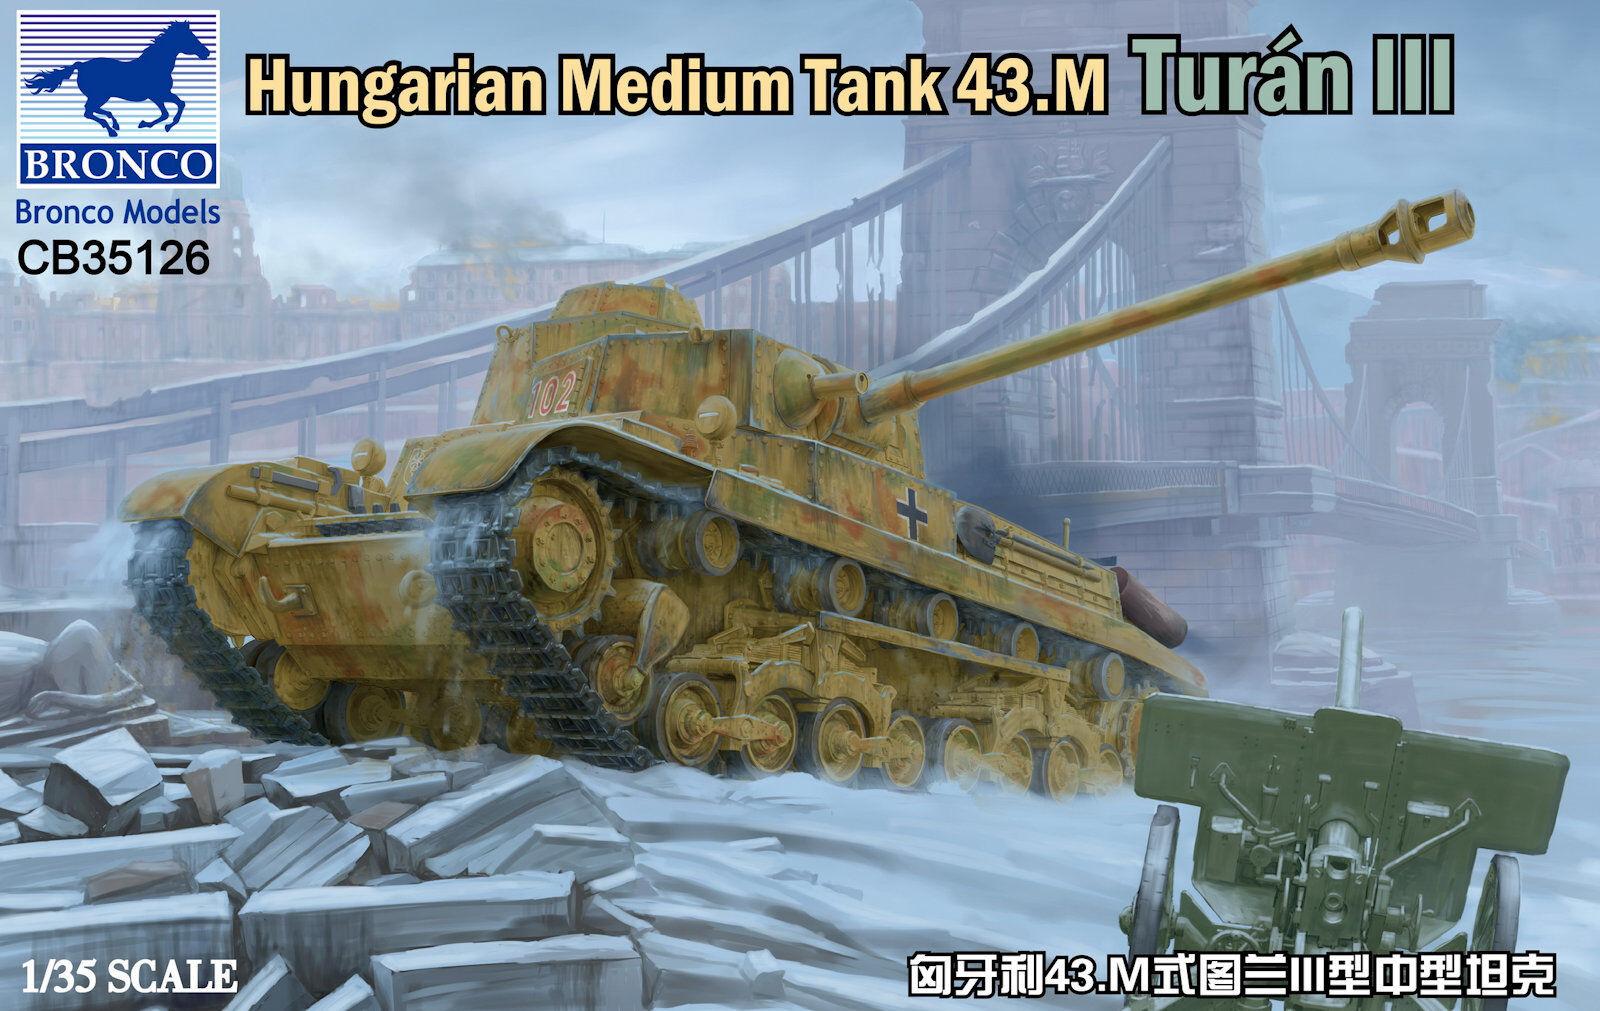 Bronco 1 35 Turan III 43.M Hungarian Medium Tank CB35126